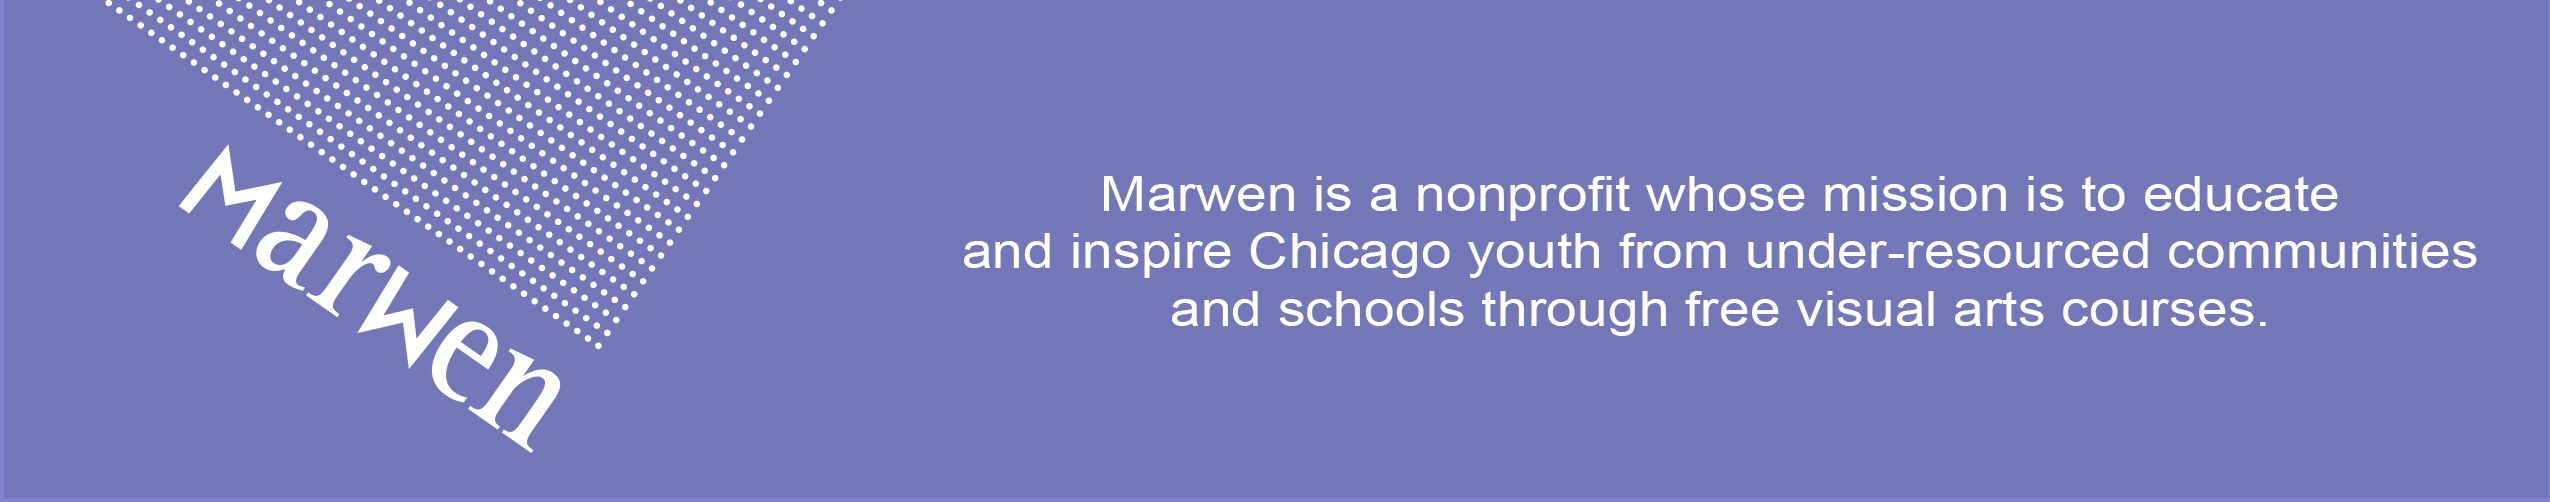 Marwen Cover